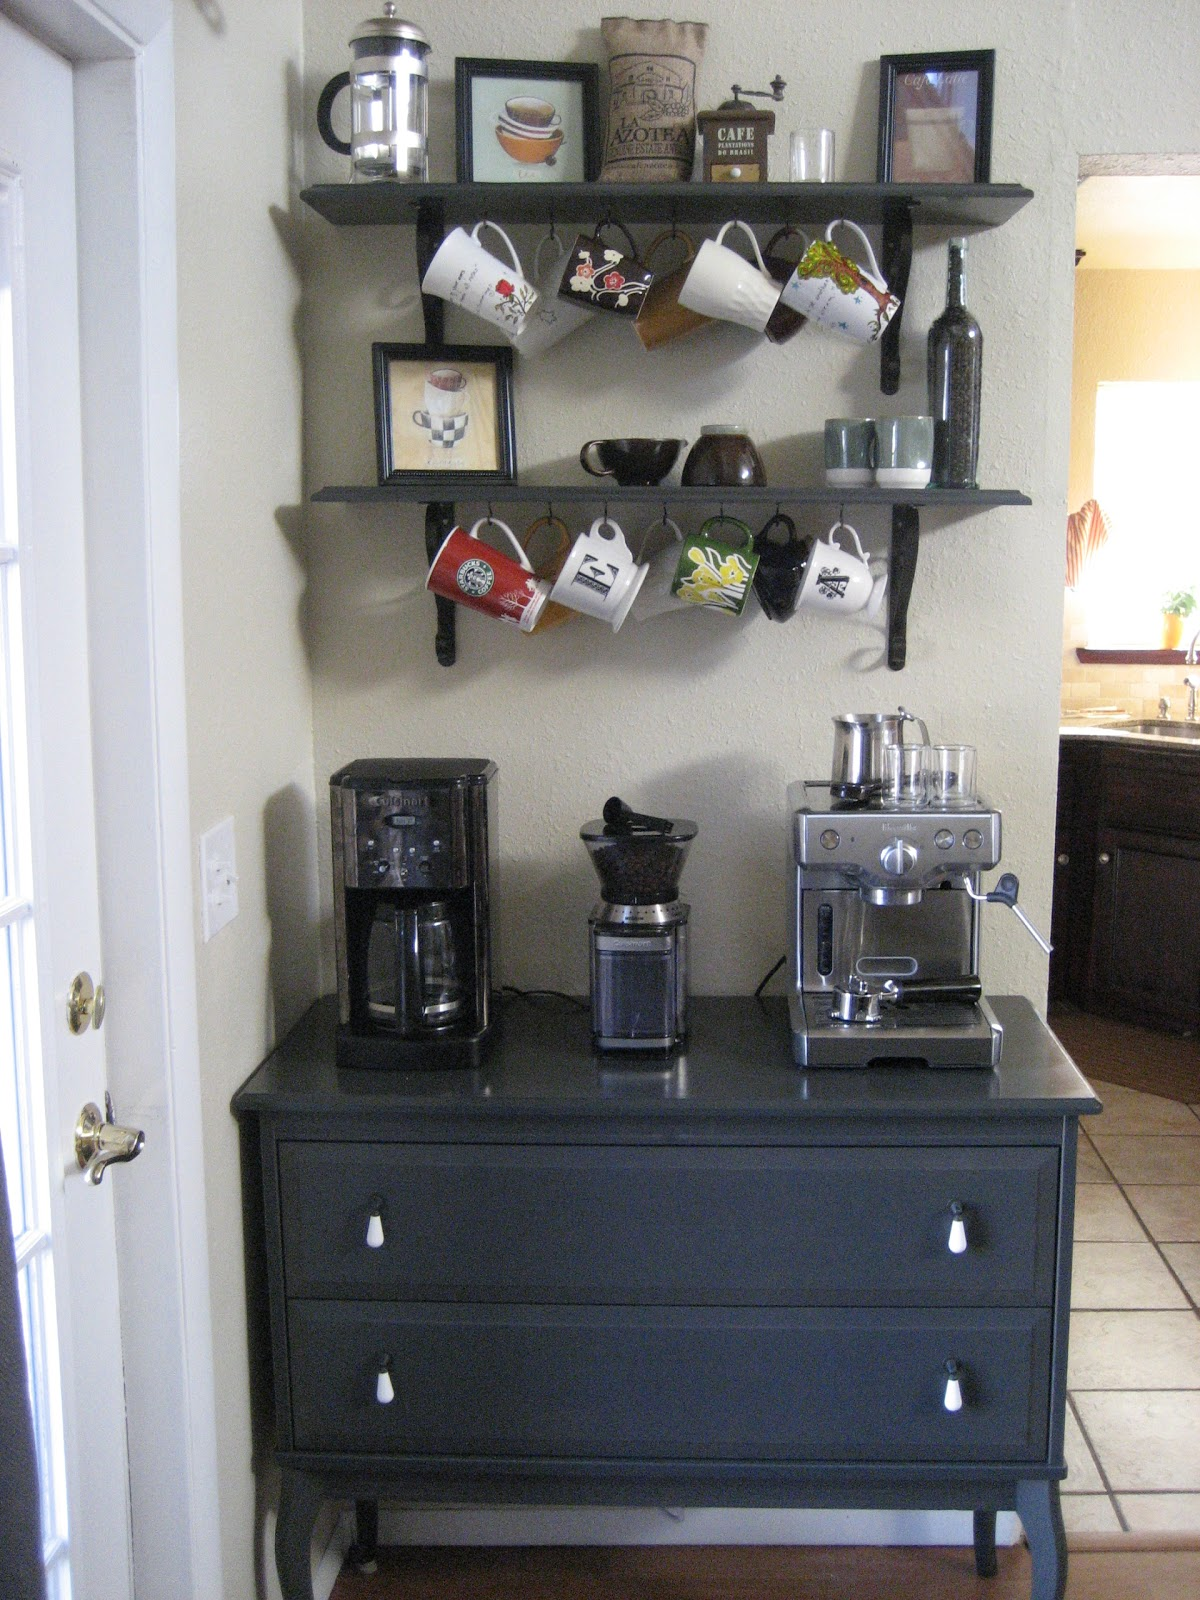 The Coffee Bar - Take 1 | The Cream to My Coffee